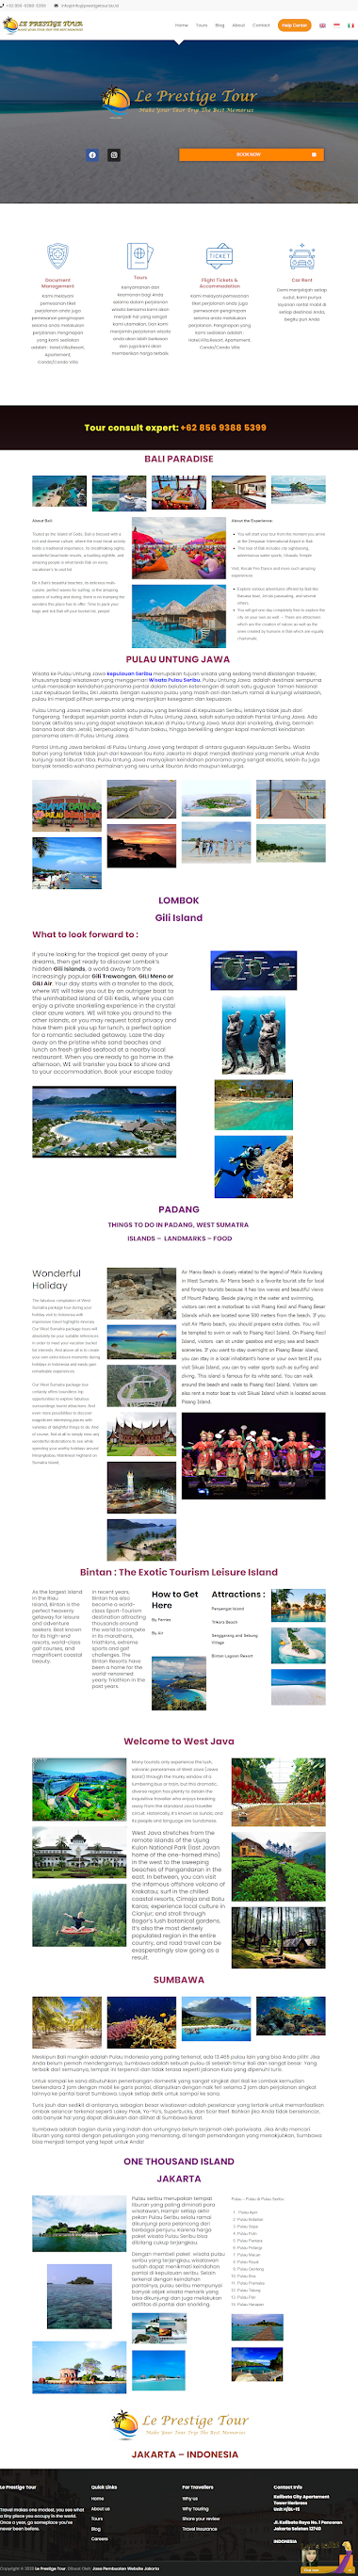 Klien Kami Dibidang Jasa Tour & Travel